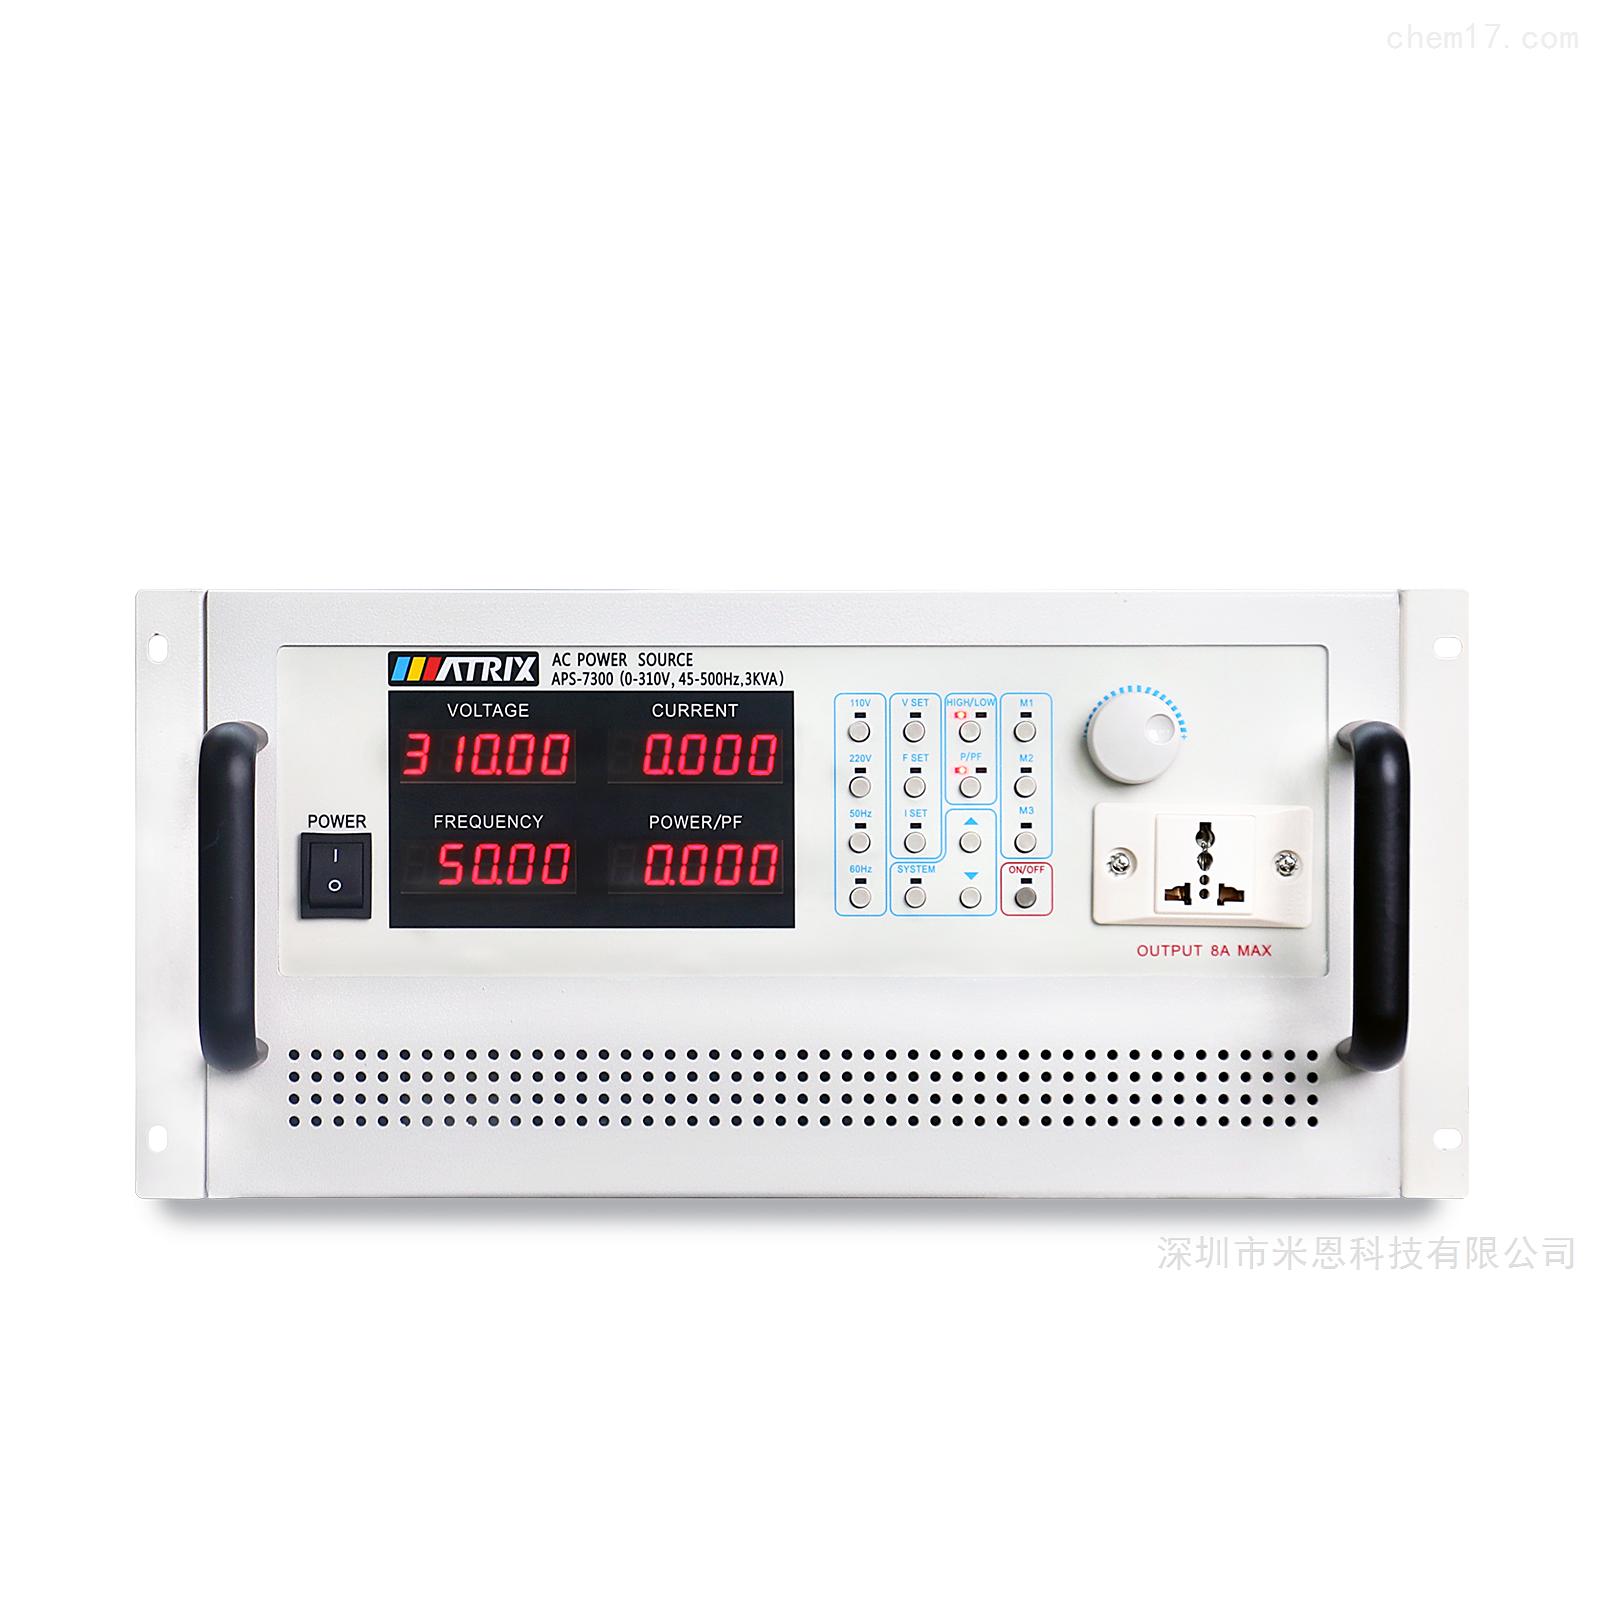 麦创Matrix APS7000系列可编程变频电源